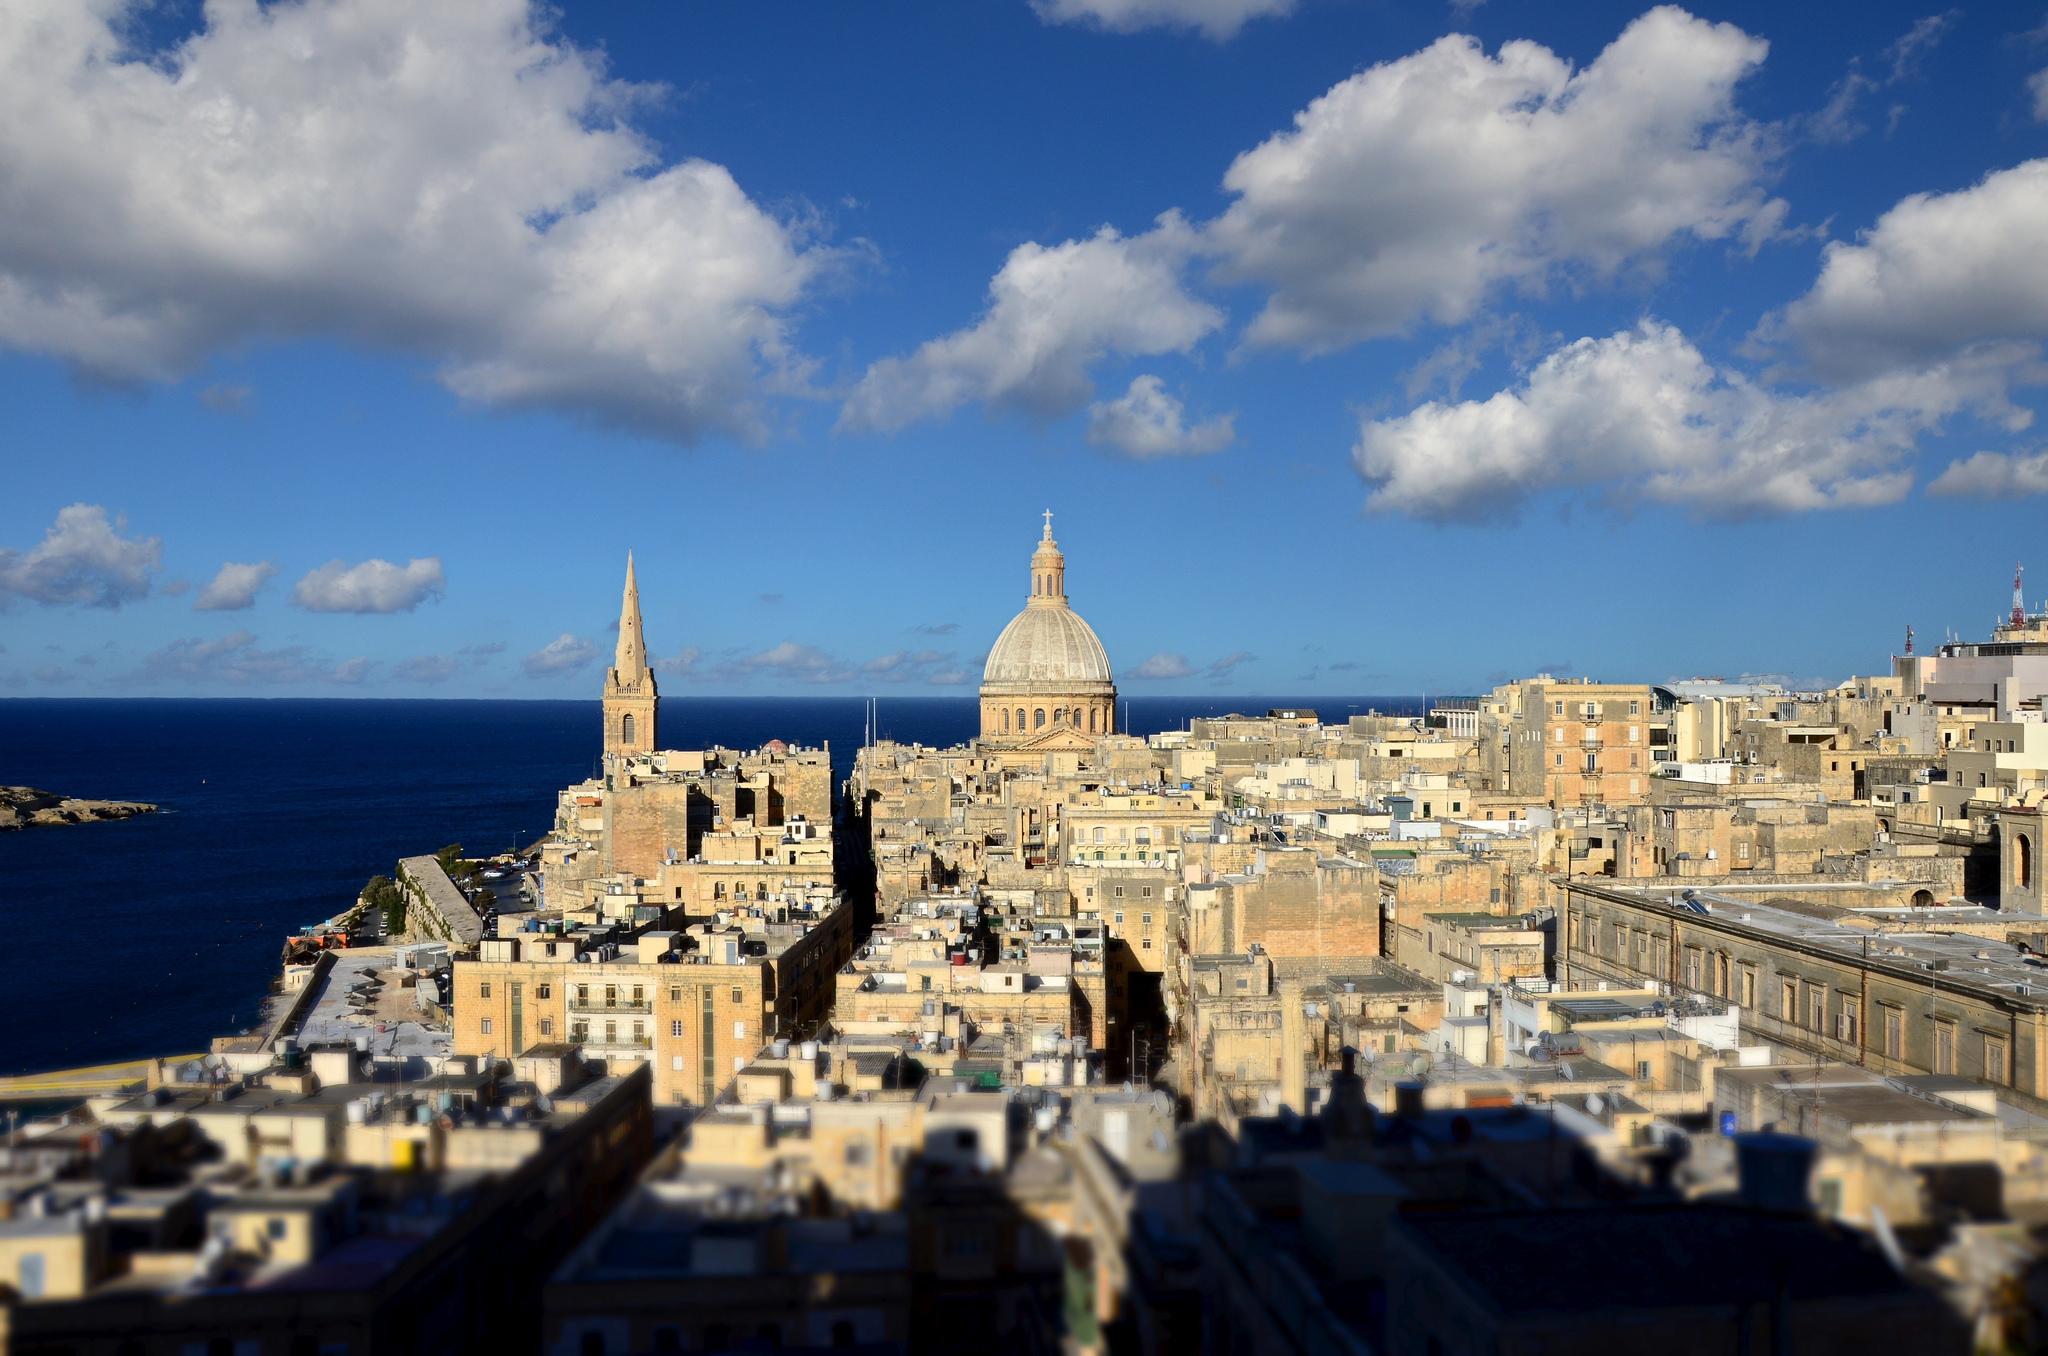 Valetta, Malta. Photo by Andrea Santoni via FlickrCCL